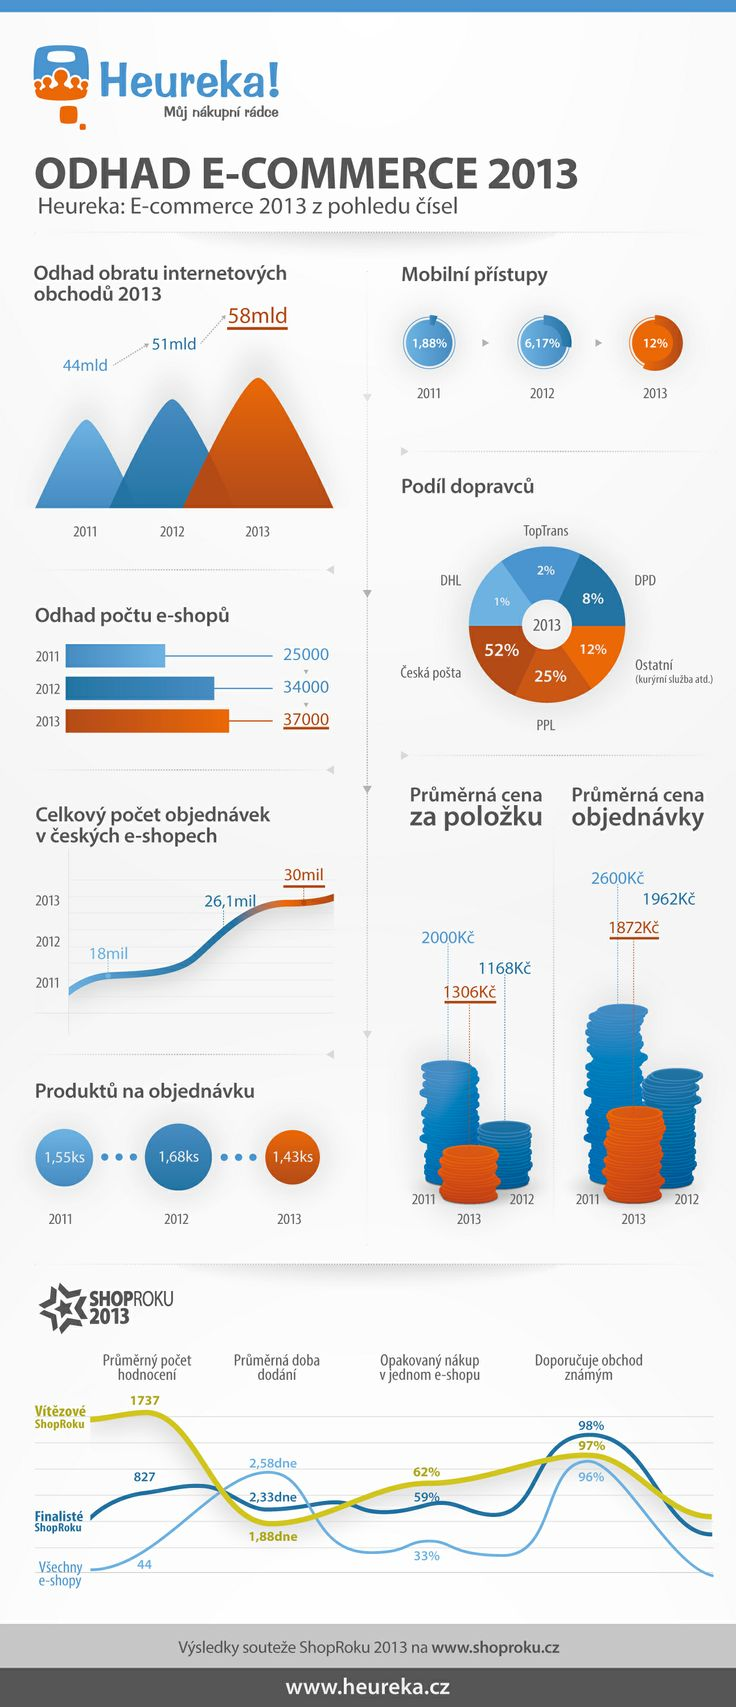 Odhad e-commerce 2013